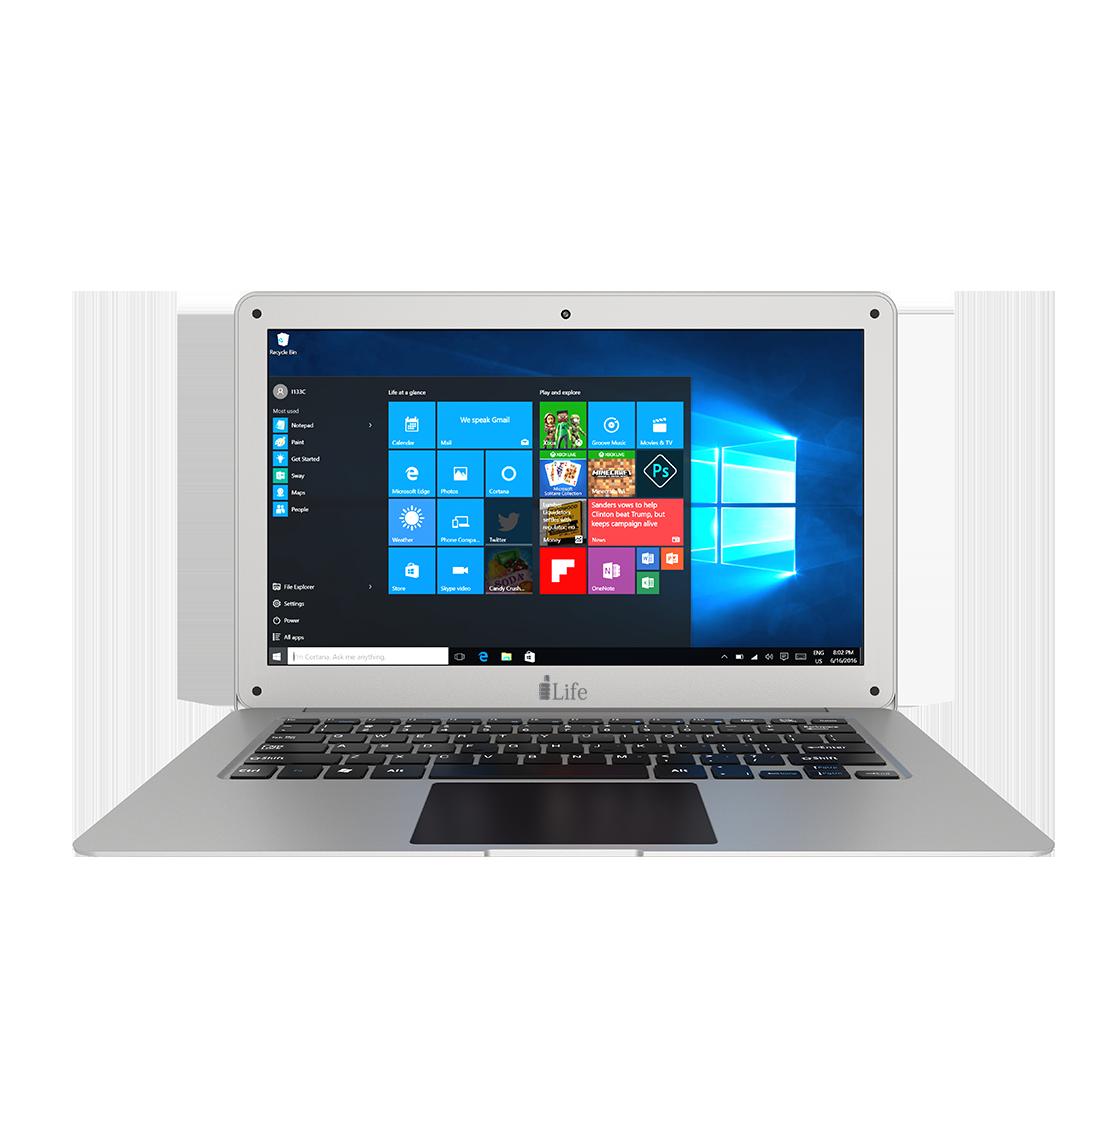 Zedair Slimmest Laptop In Its Category 14 Inch Notebook